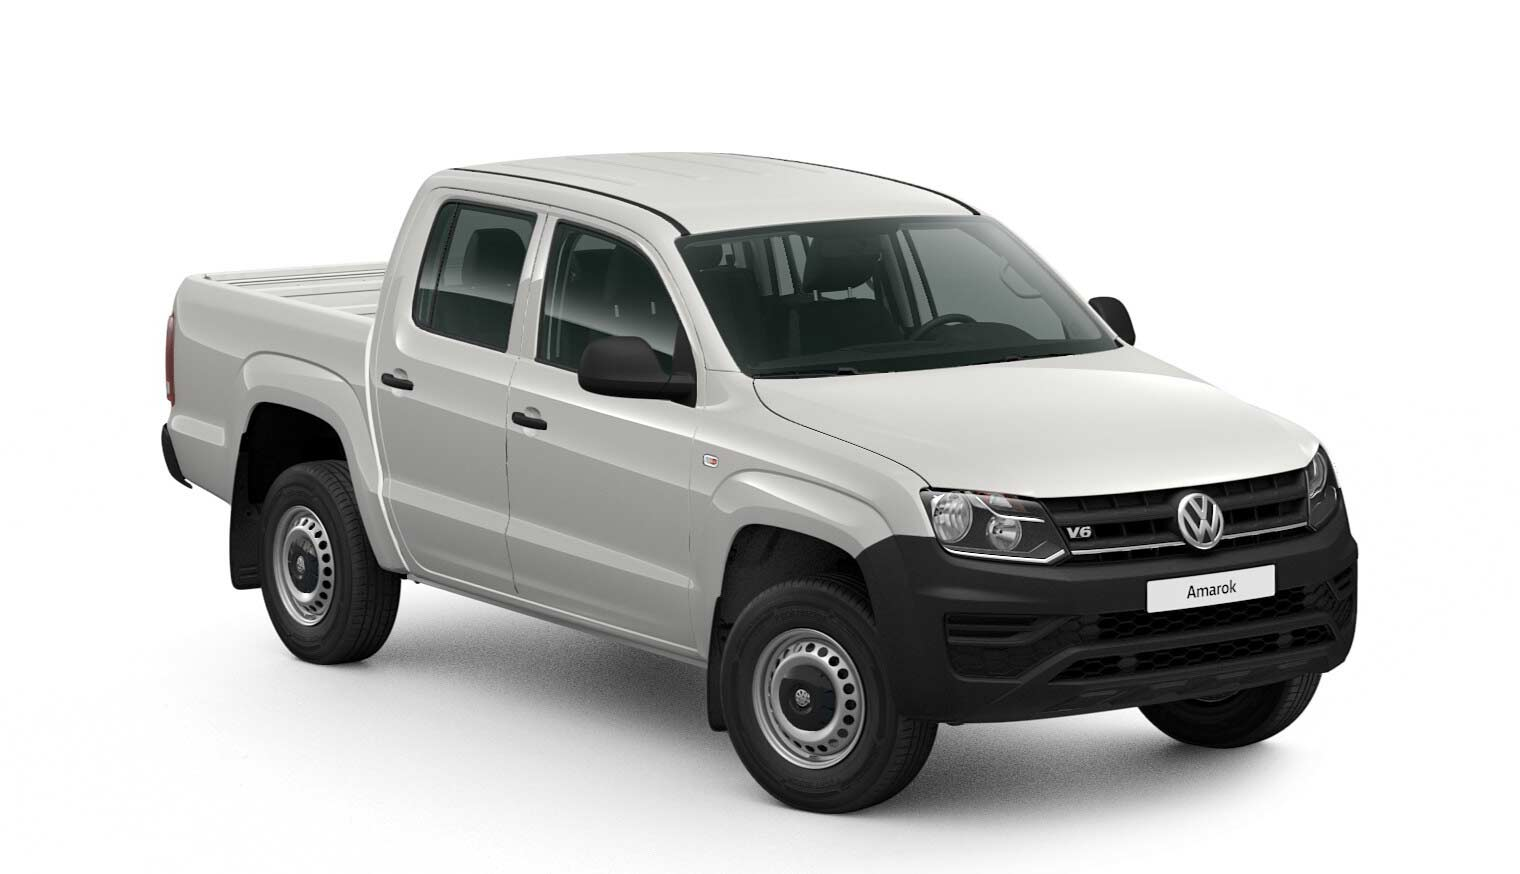 Amarok DC Trendline Motor: 3,0 l TDI EU6 SCR BlueMotion Technology 120 kW Getriebe: 4MOTION 6-Gang-Schaltgetriebe Radstand: 3095 mm